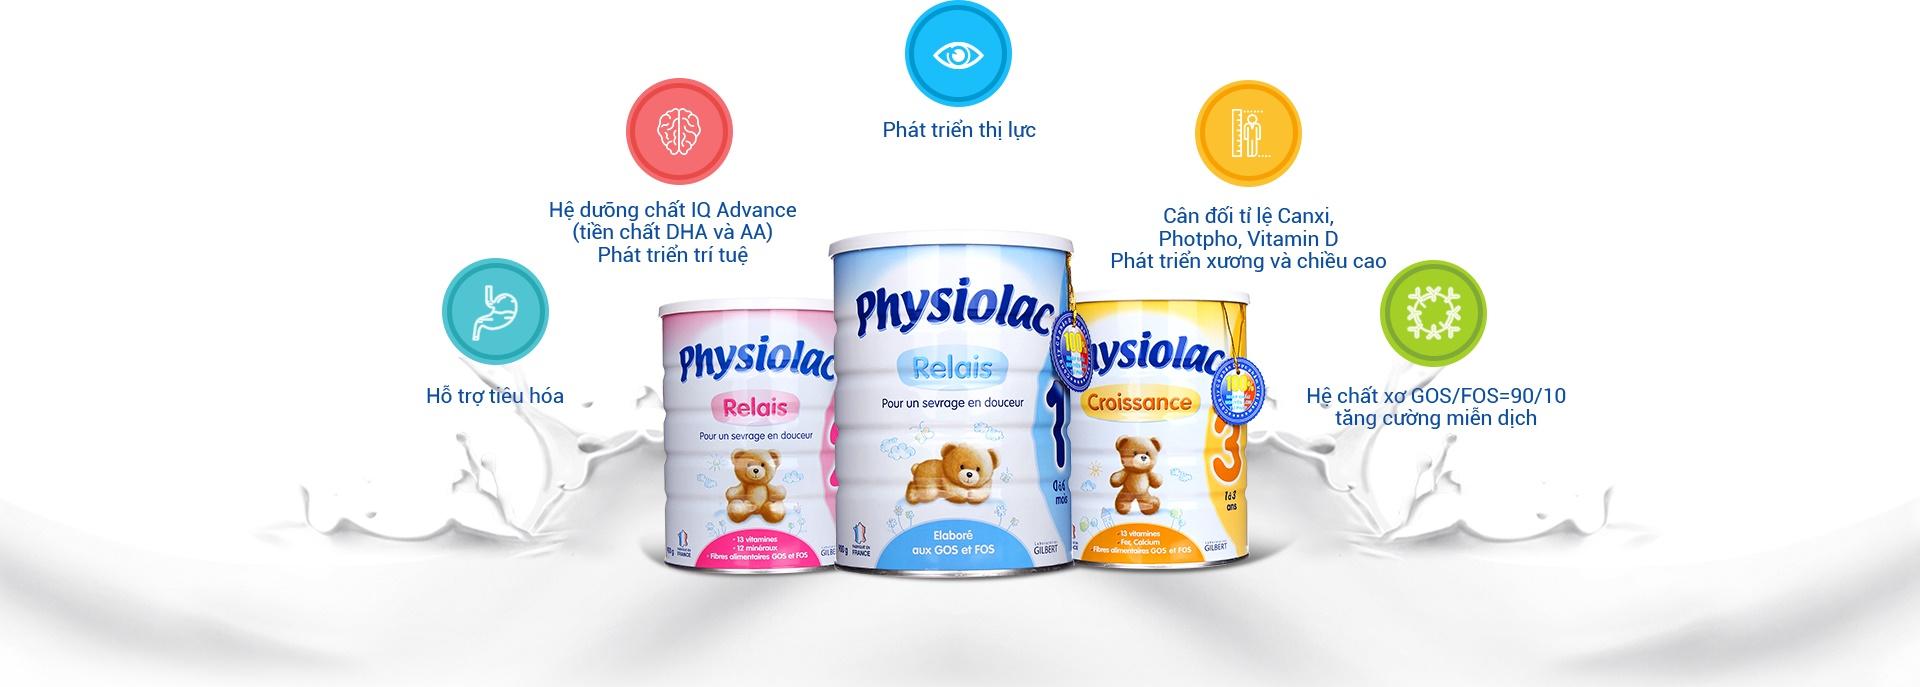 sua-physiolac-10